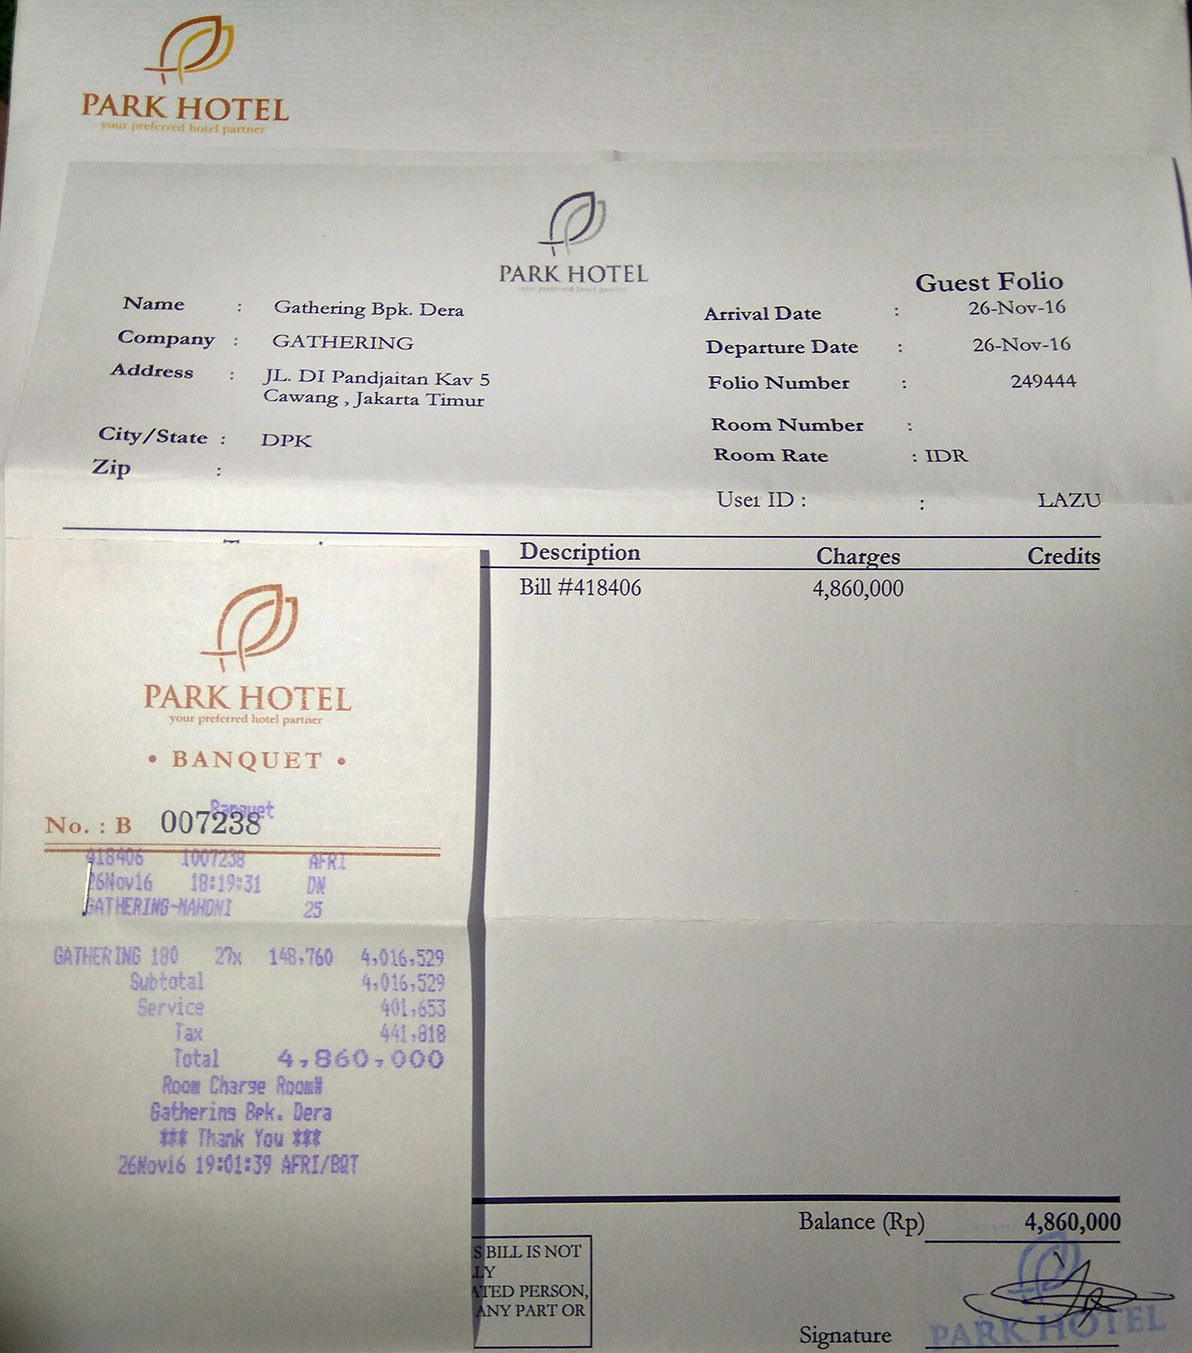 pembayaran park hotel